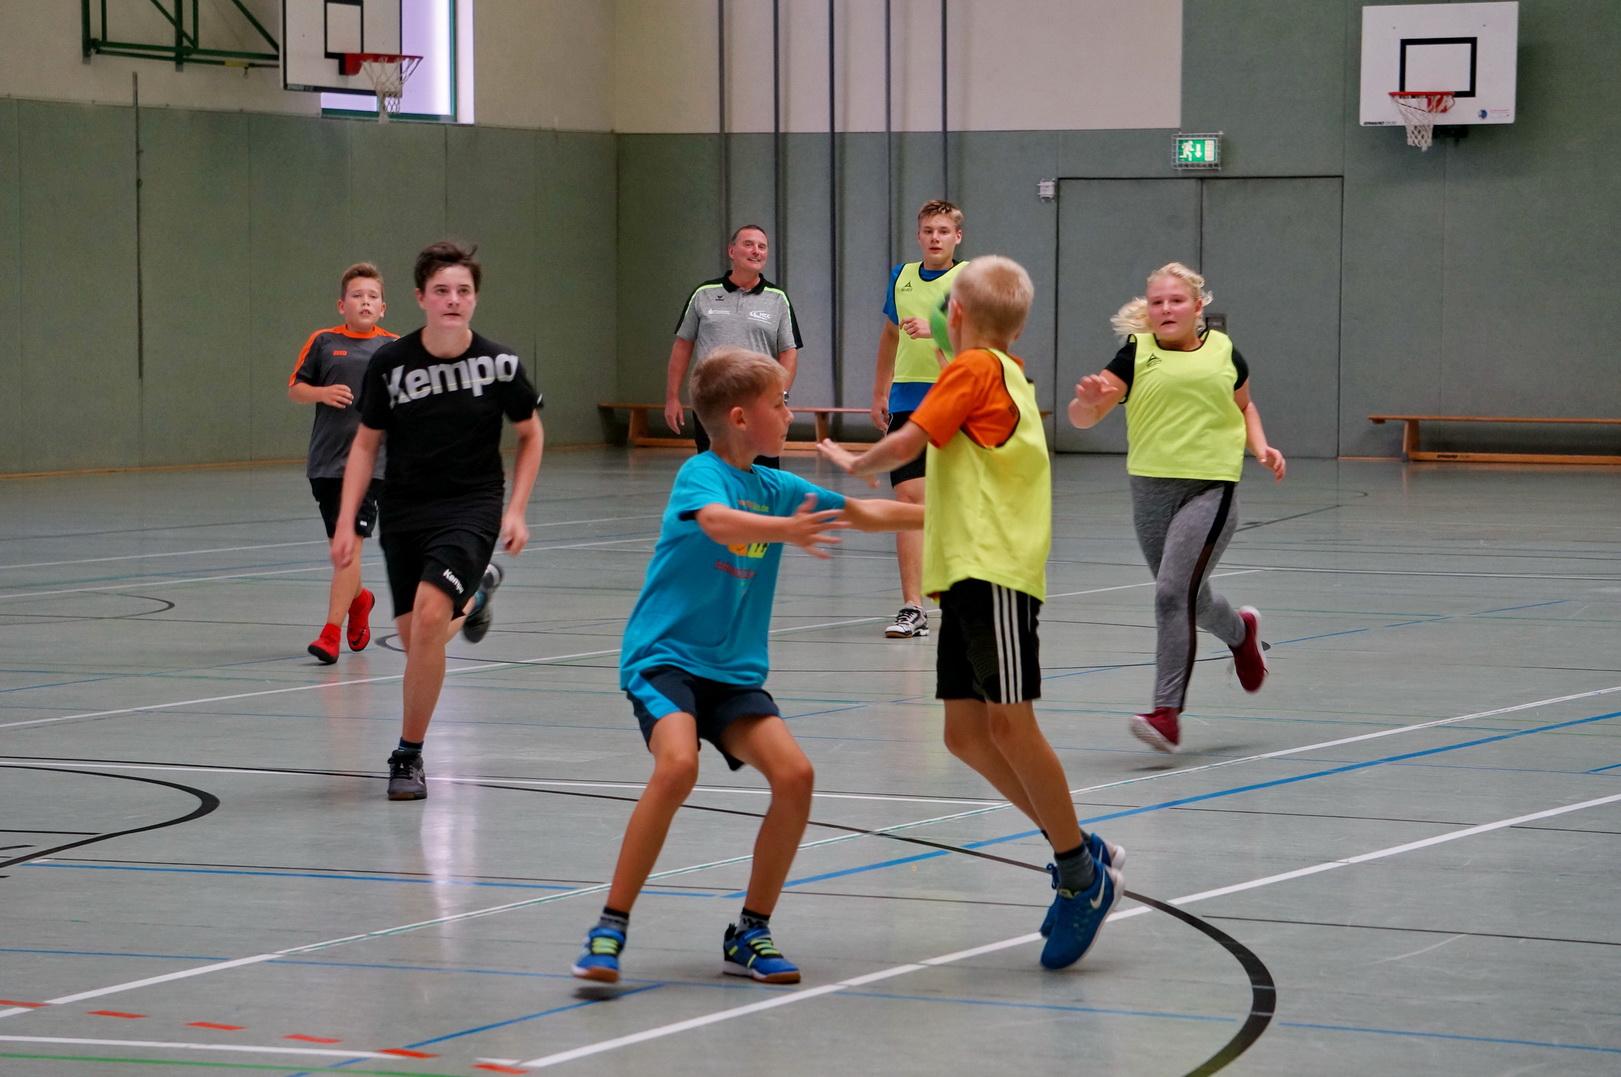 201808_Handballcamp_SDH_MG_127w